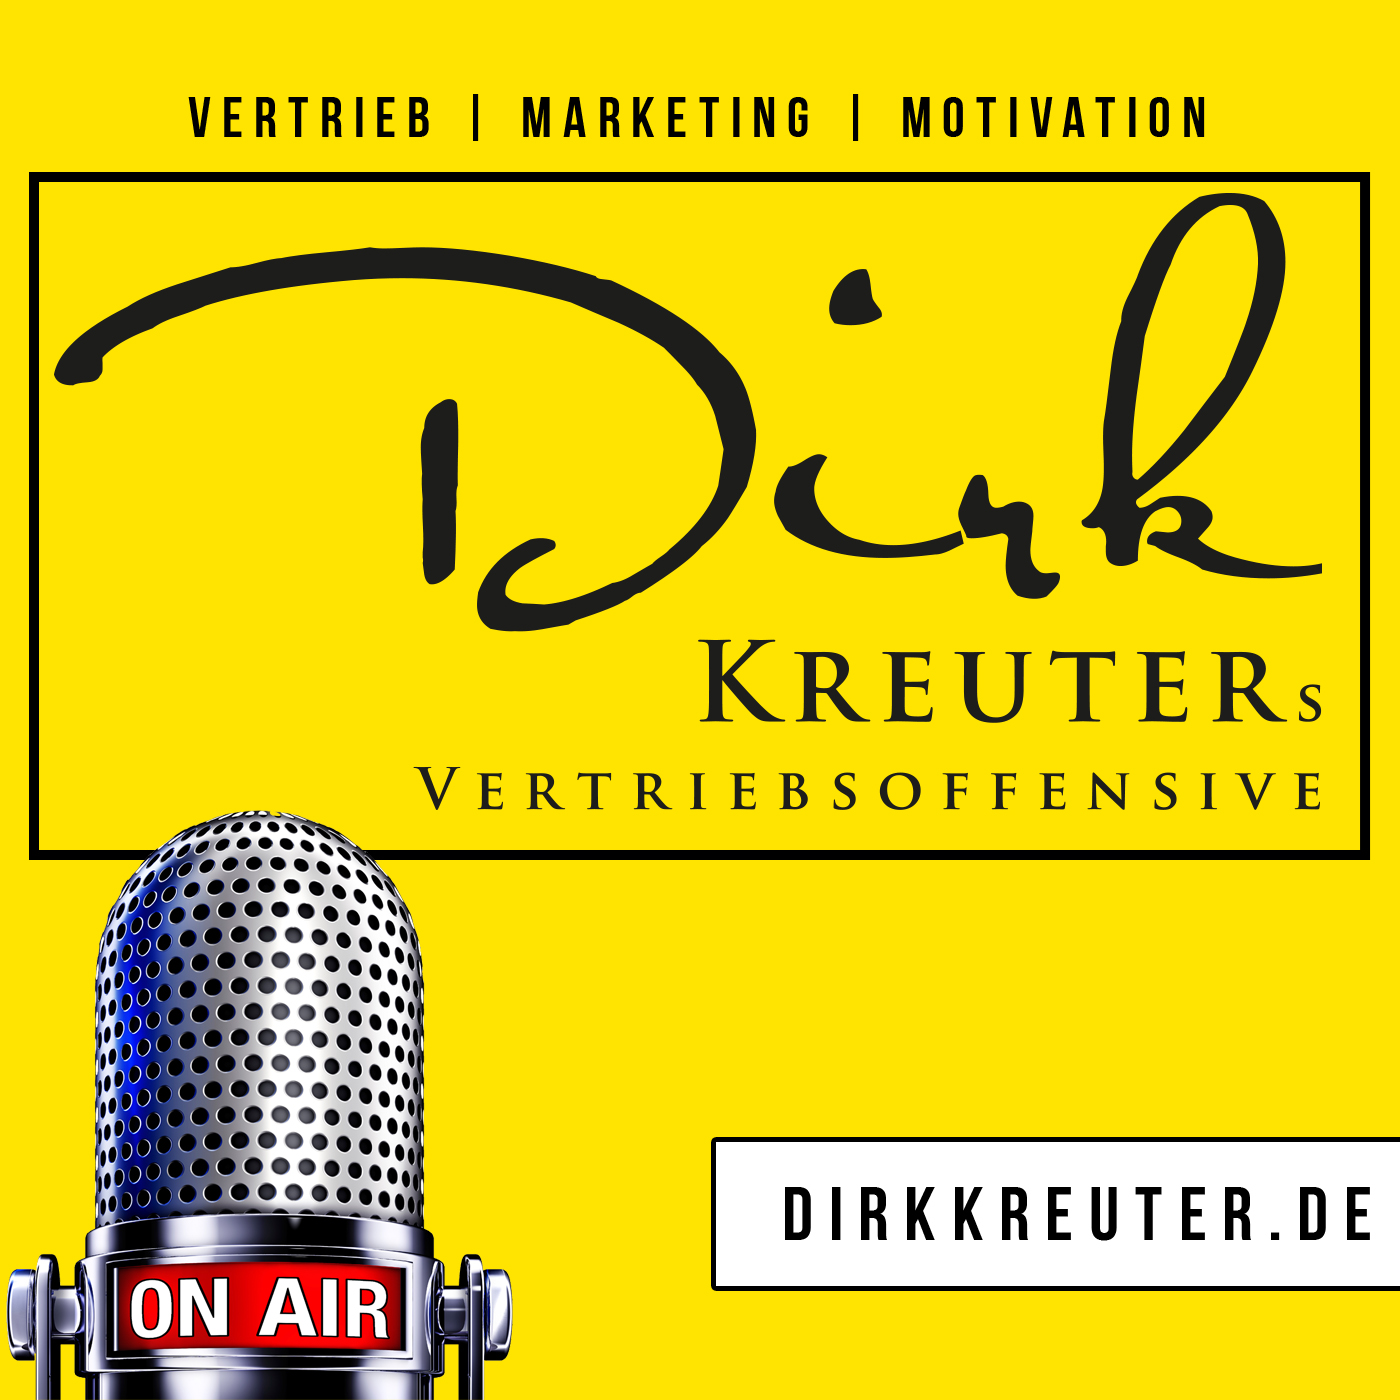 Dirk Kreuters Vertriebsoffensive: Verkauf | Marketing | Vertrieb | Führung | Motivation show art